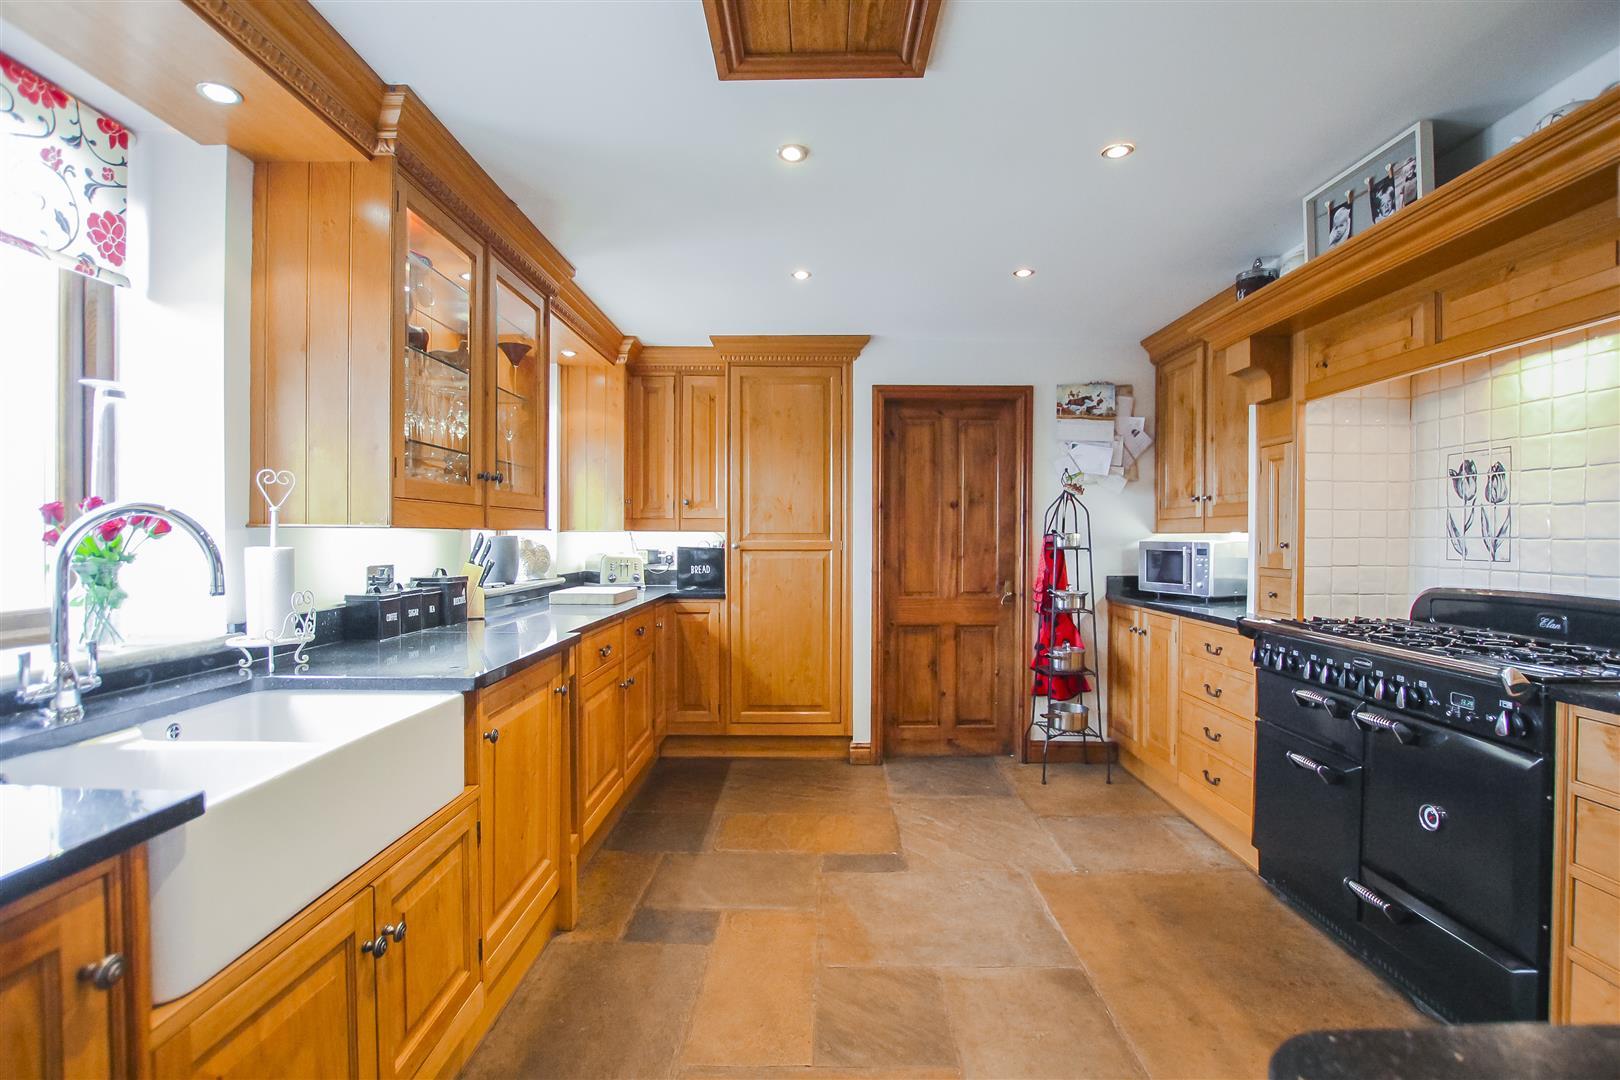 4 Bedroom Semi-detached House For Sale - Image 3